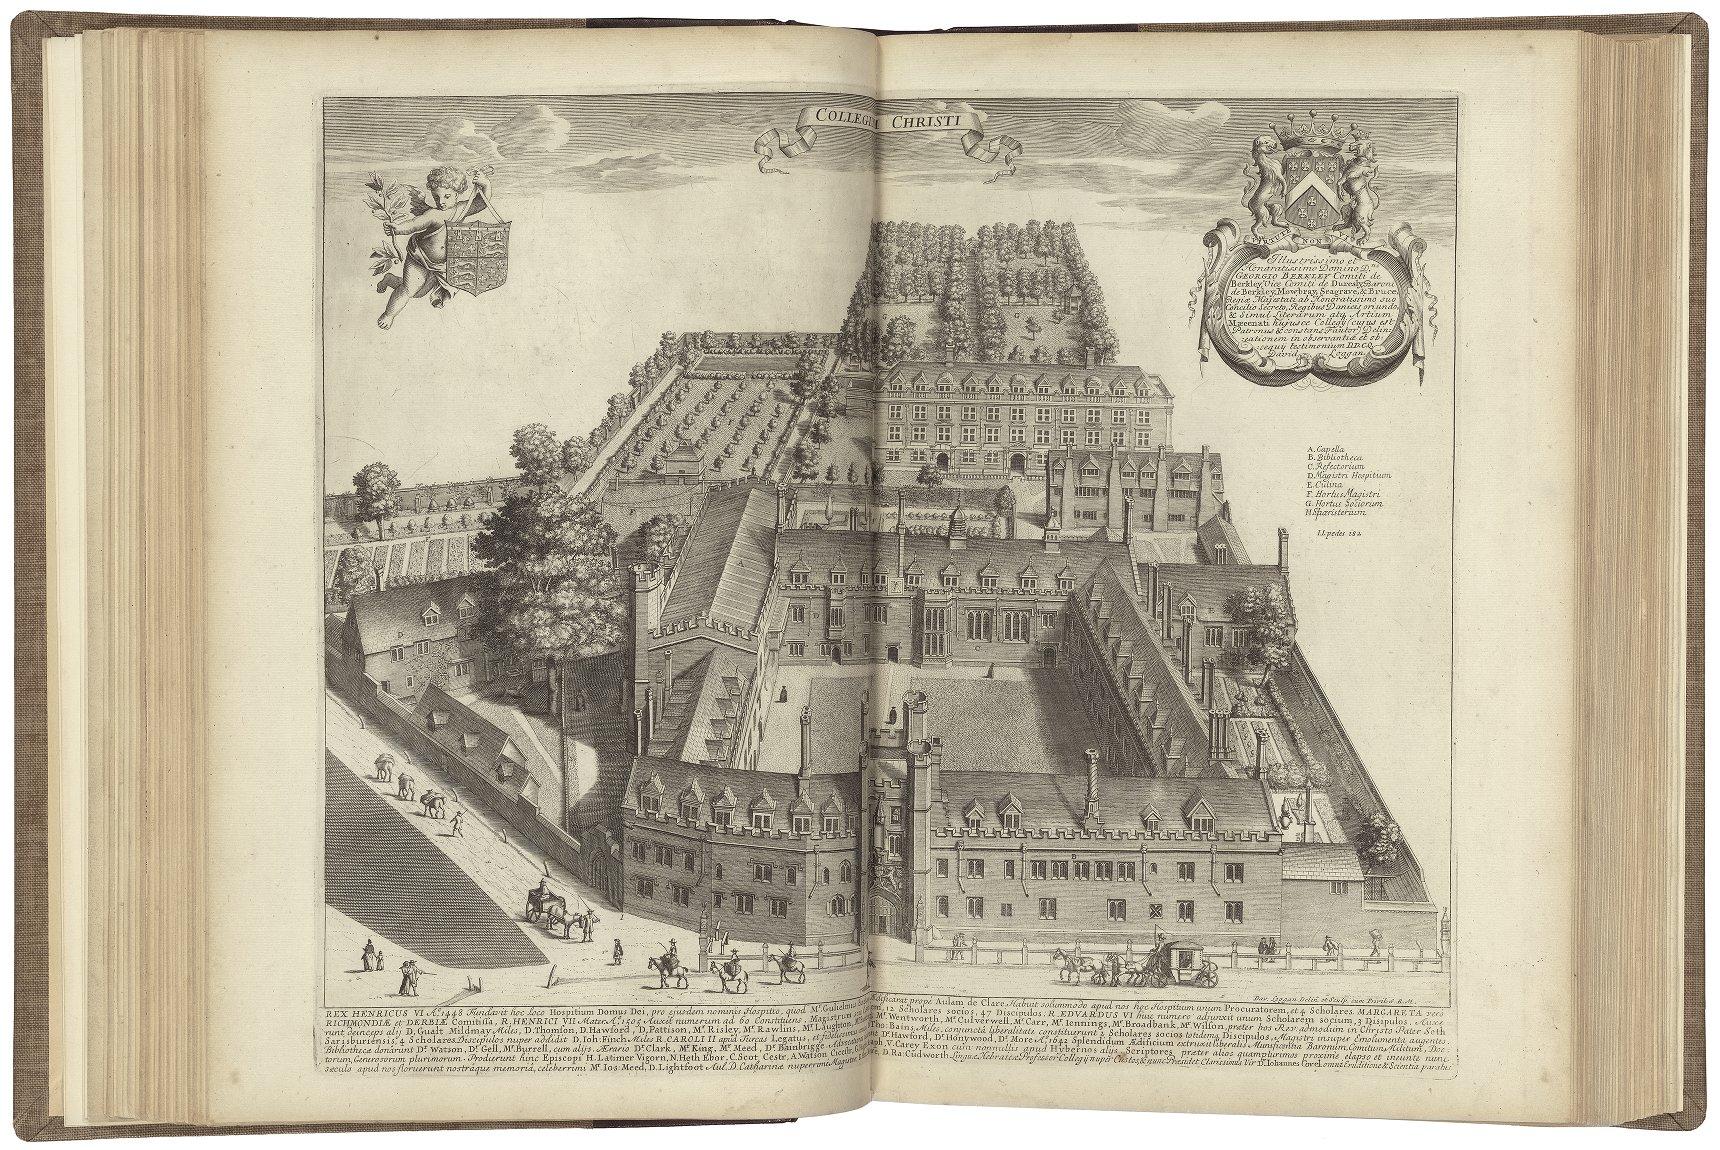 Illustration of the Corpus Christi College